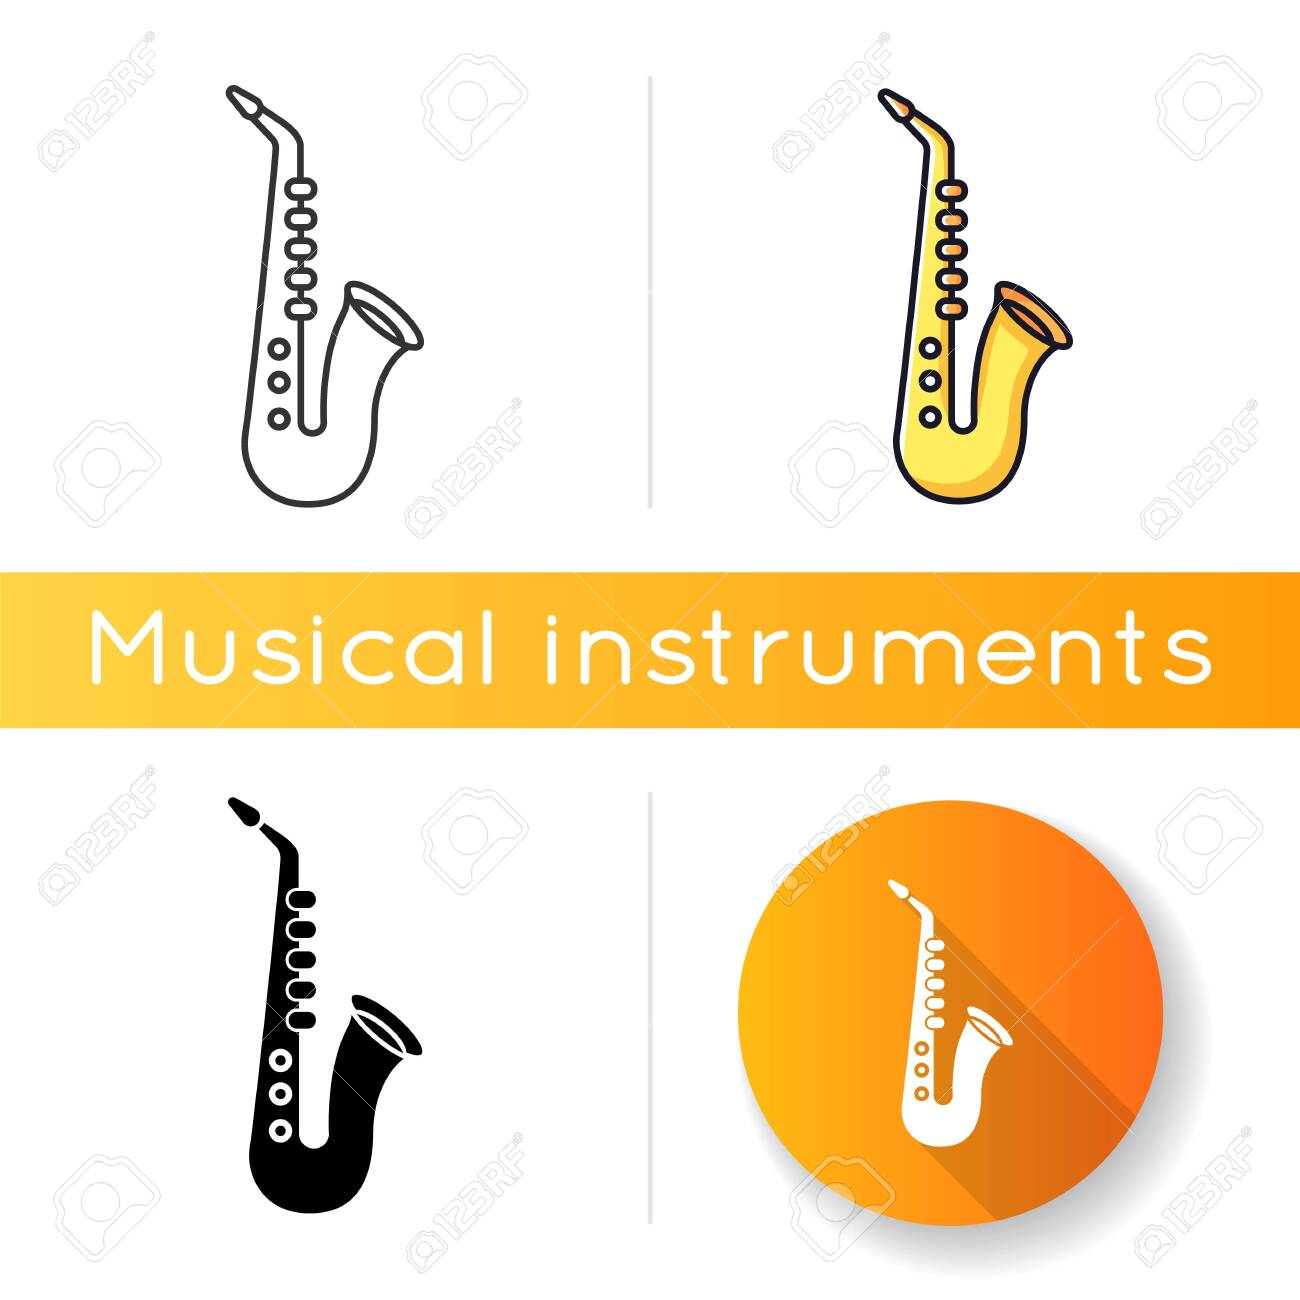 blues music clip art | , stock clip art icon, stock clipart icons, logo,  line art ... | Saxophone players, Saxophone, Music artwork